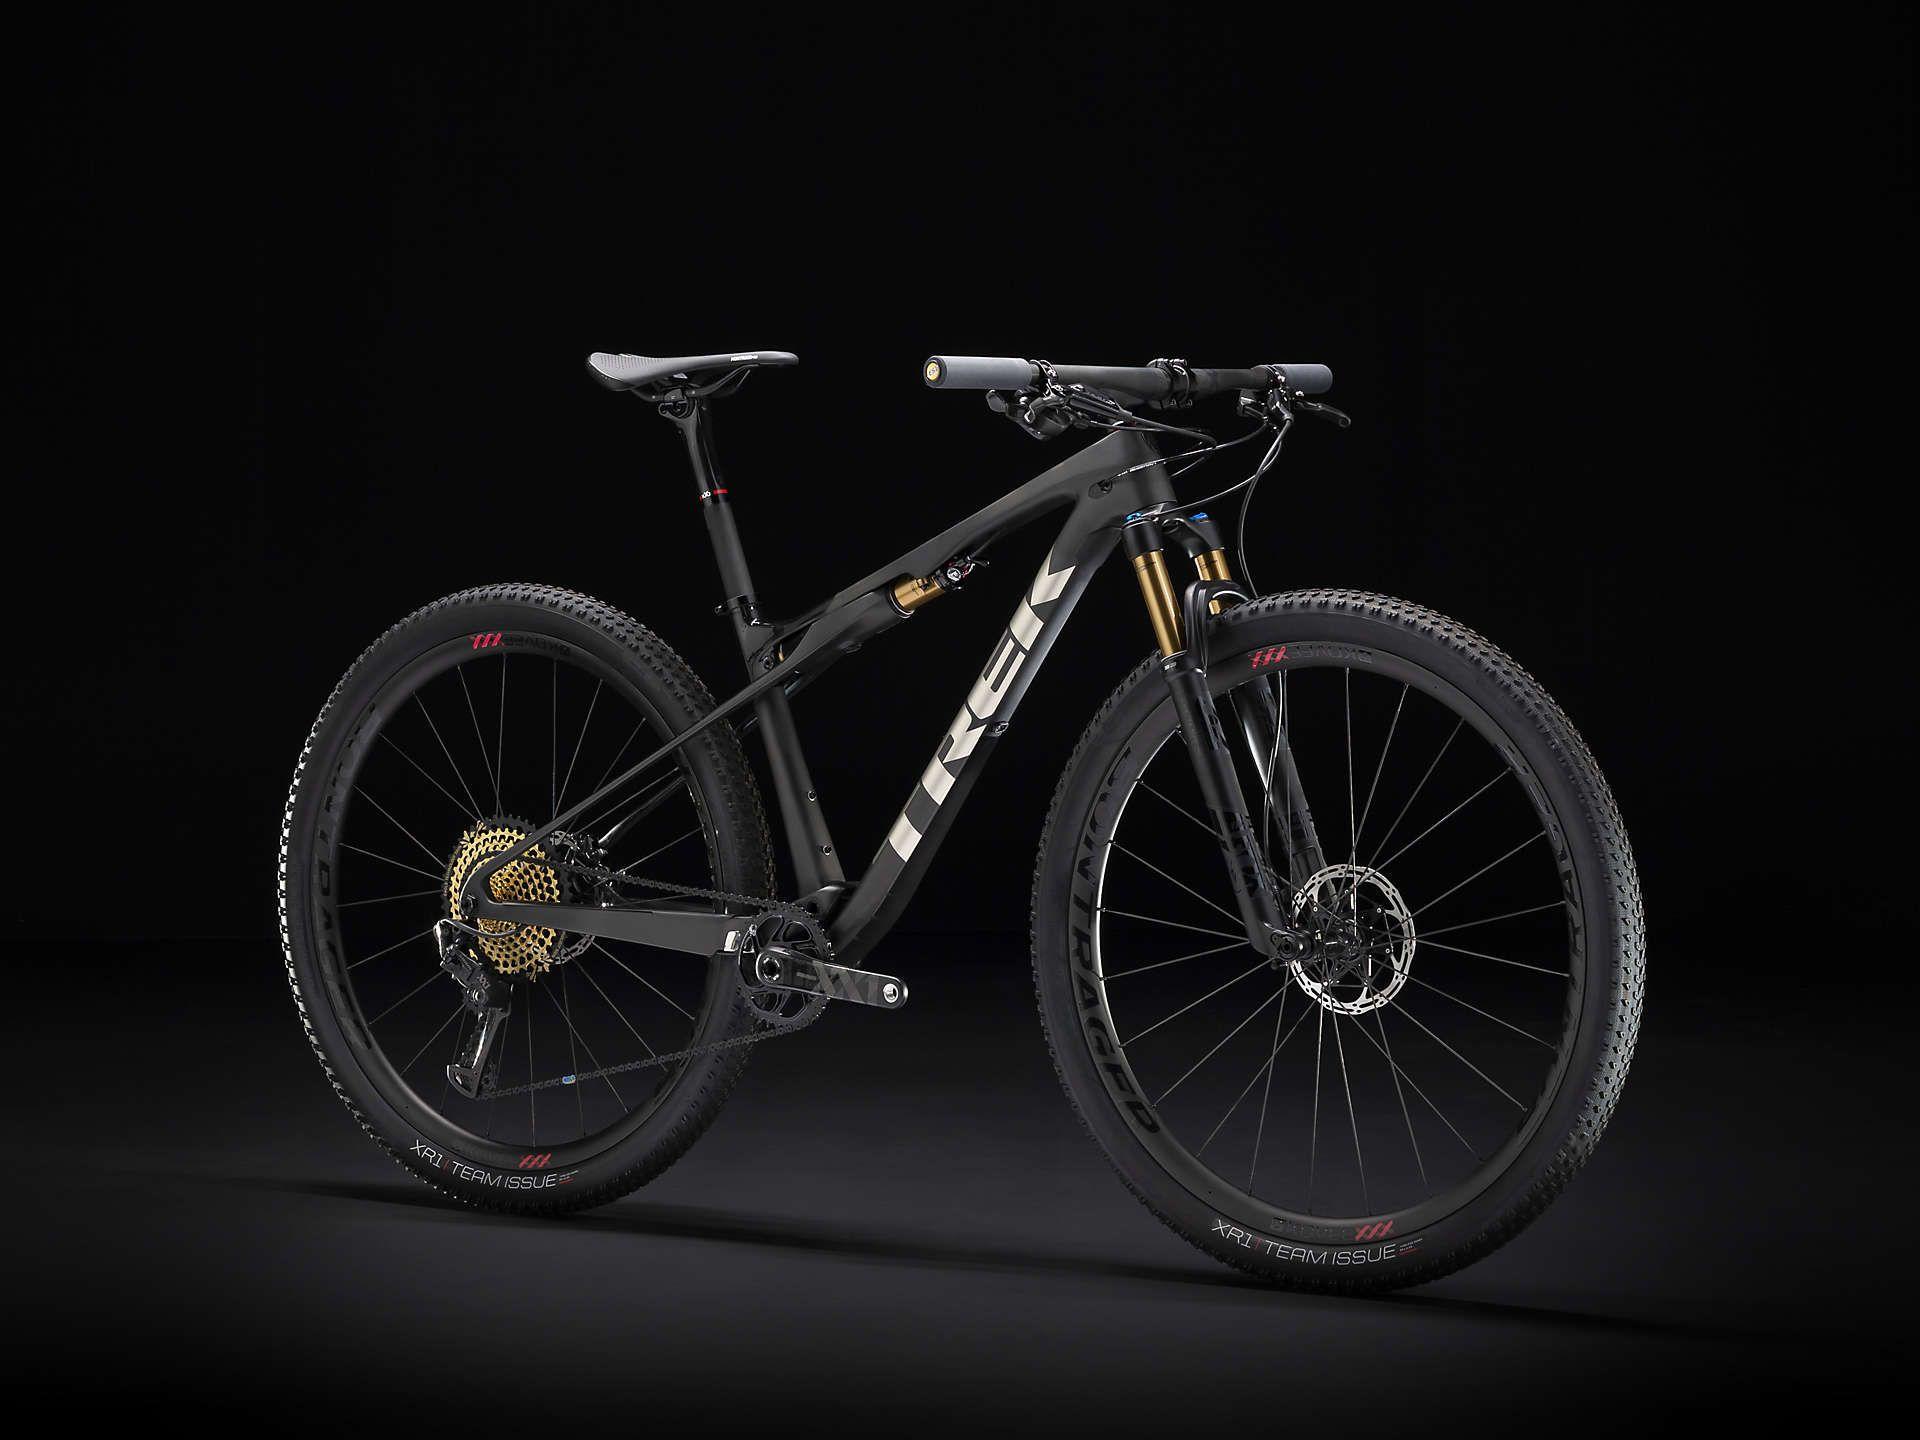 Supercaliber 9 9 Trek Bikes Za Cross Country Vtt